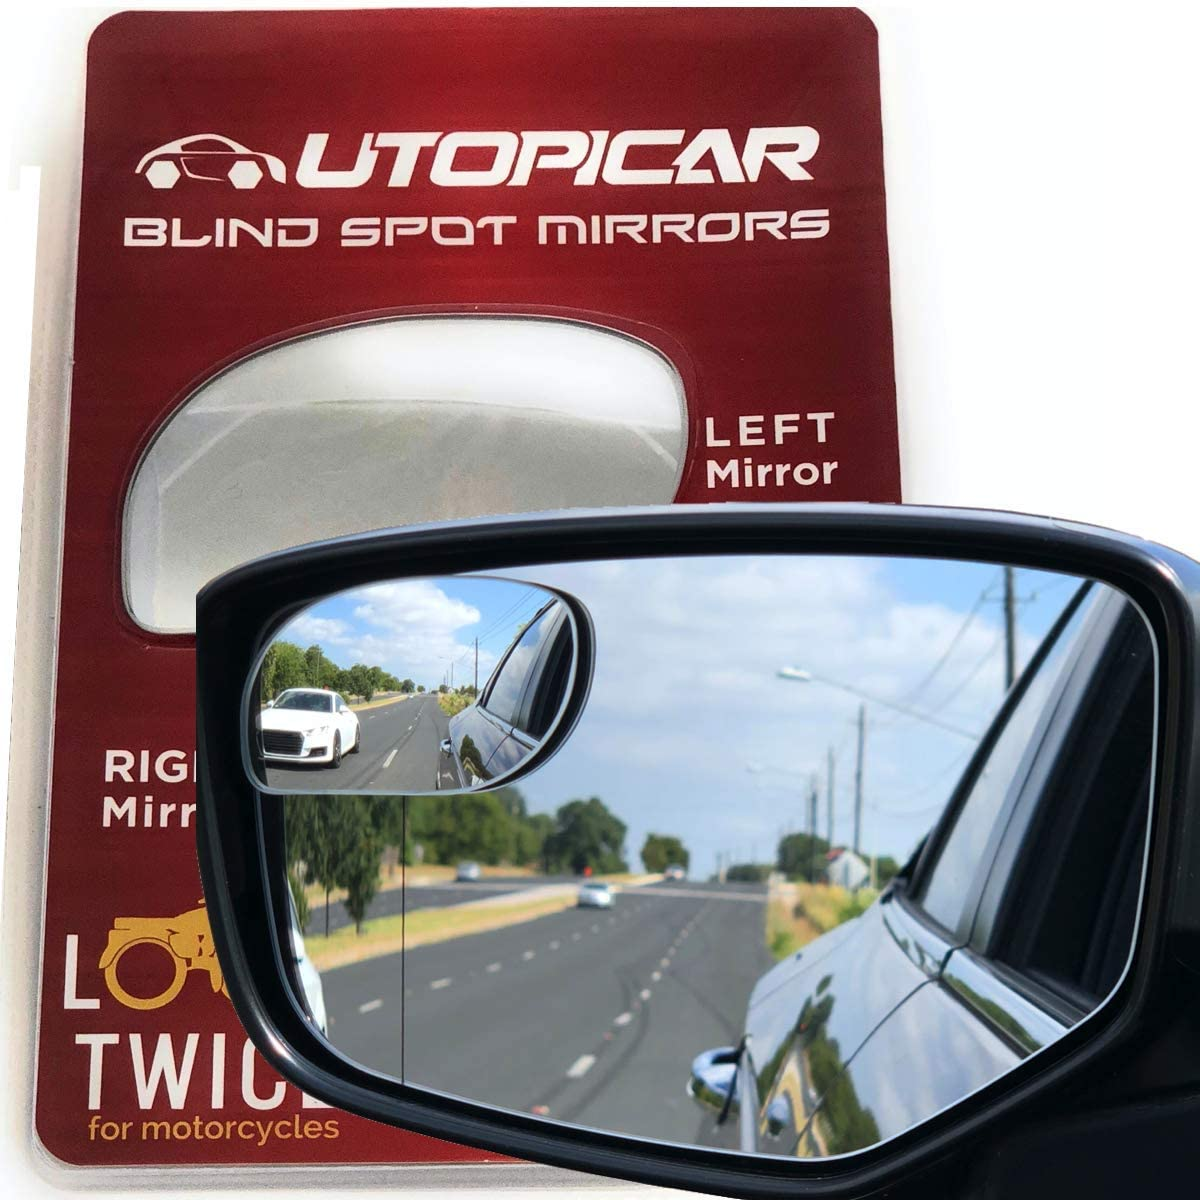 Blind Spot Mirrors